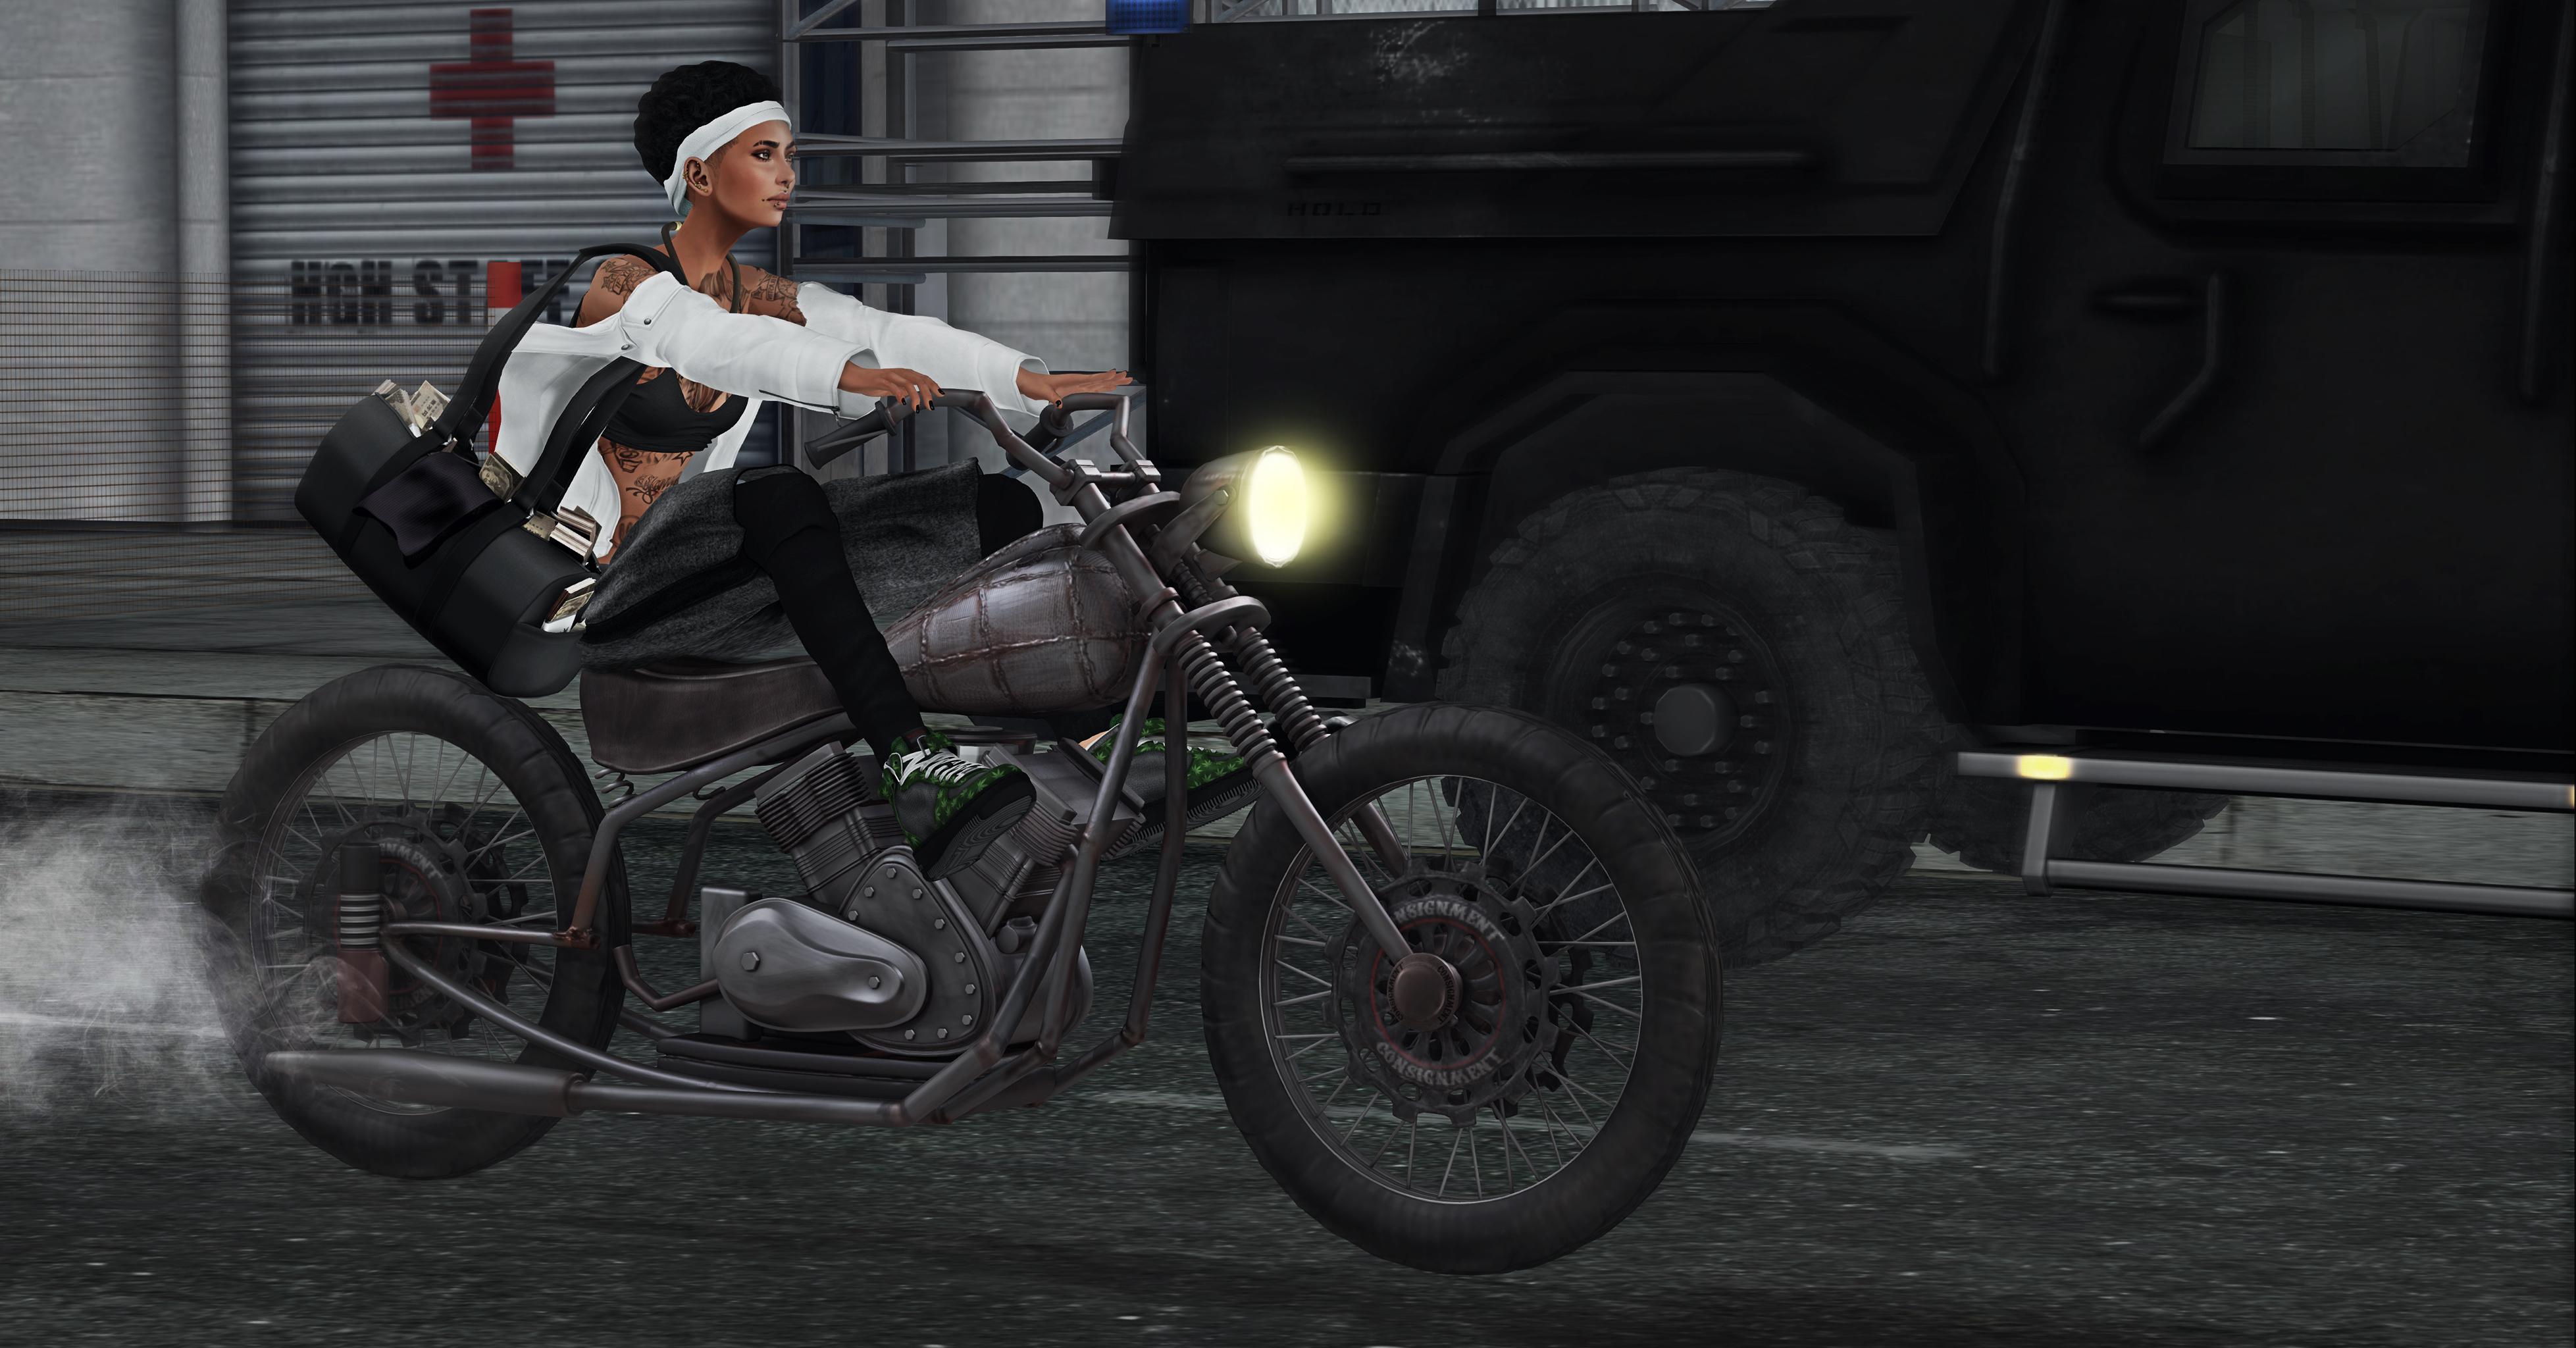 A ride